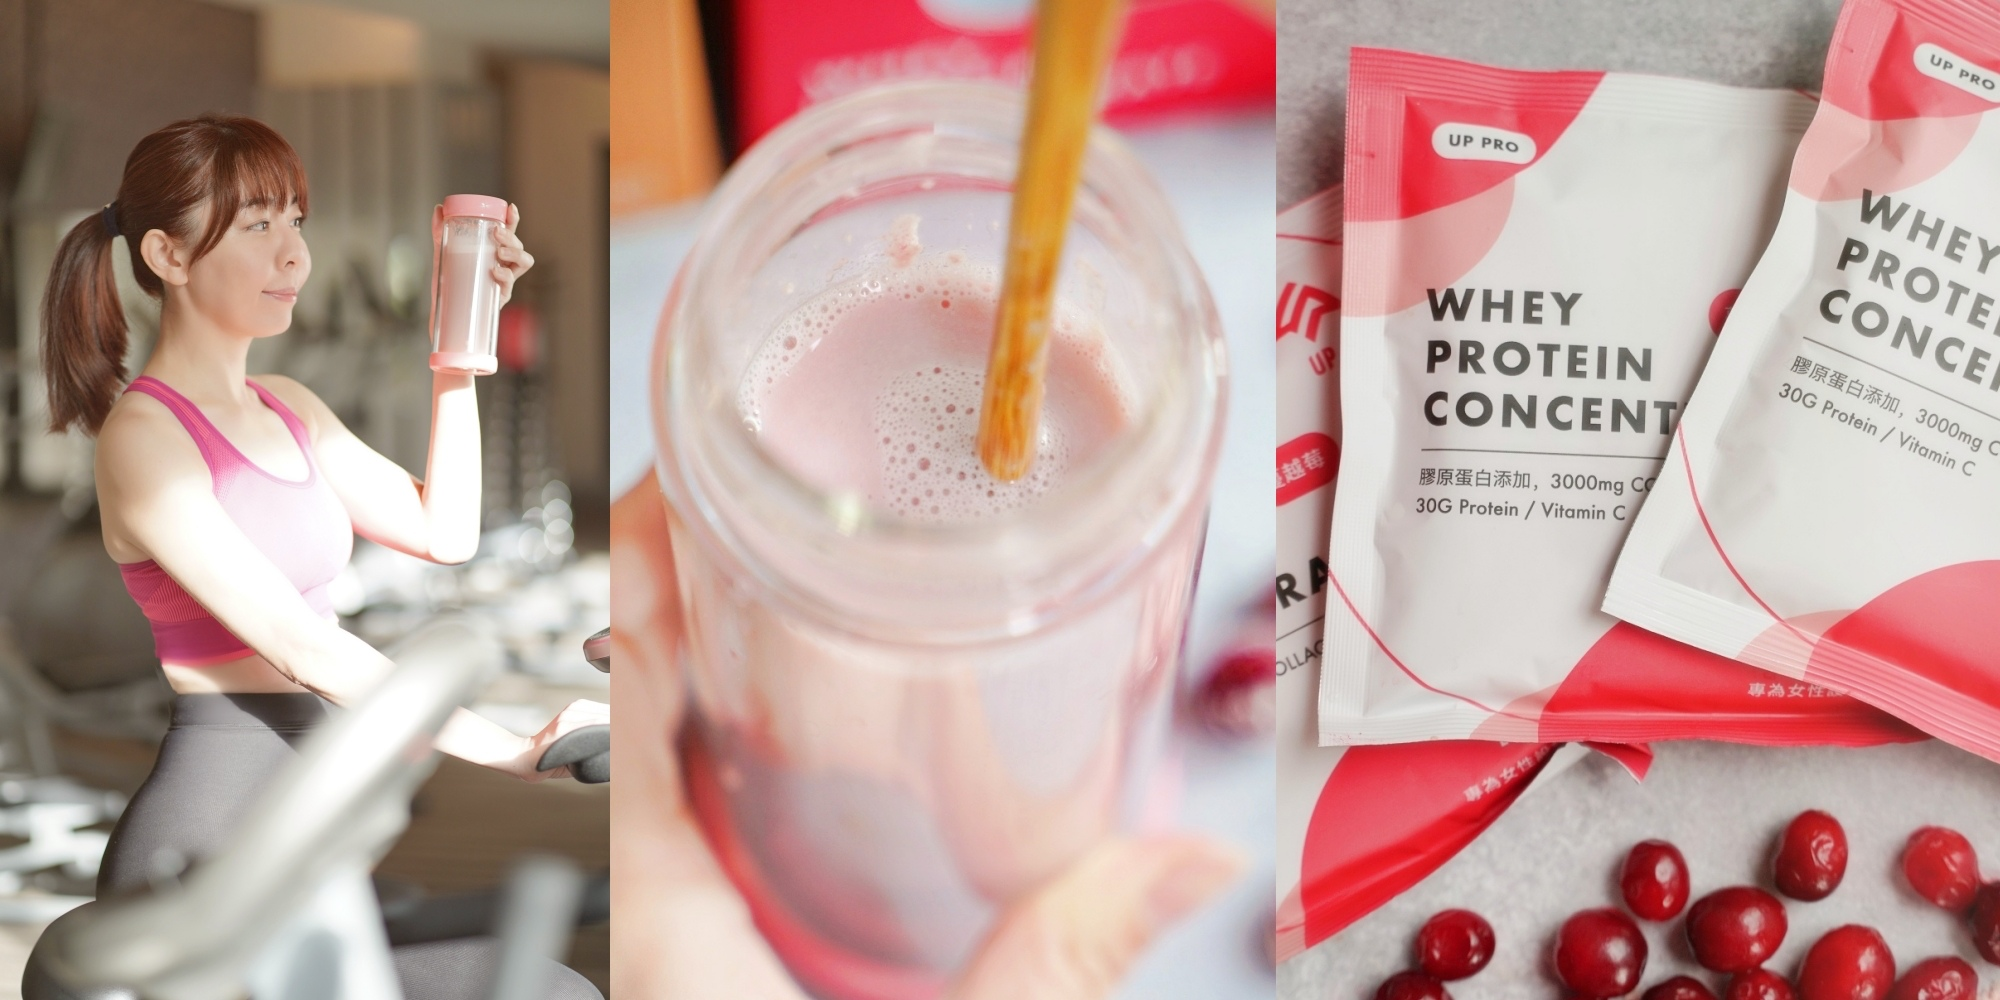 UP Sports|UP乳清膠原蛋白|運動女生最愛的乳清蛋白|乳清蛋白推薦|乳清蛋白怎麼喝